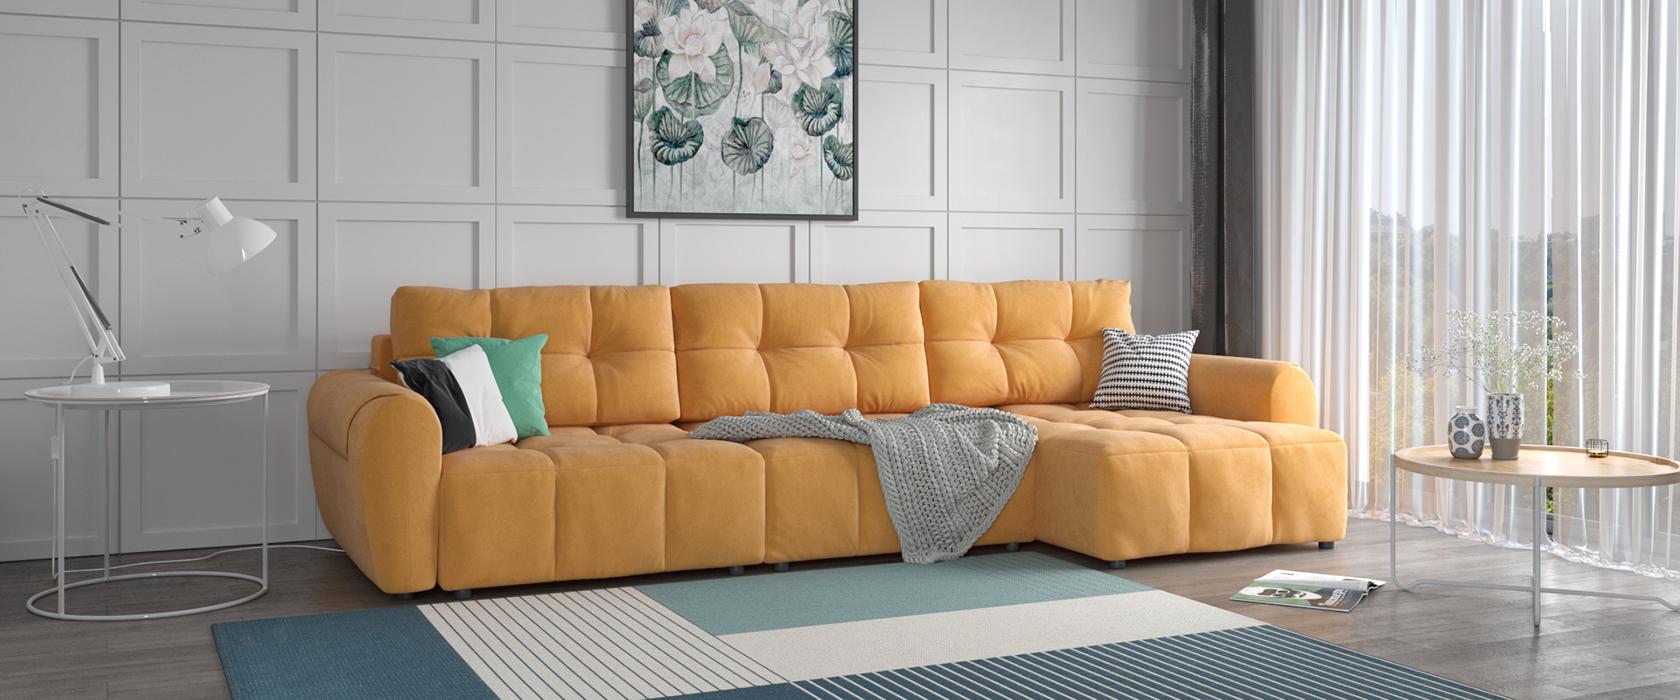 Угловой диван Bernardo - Фото 2 - Pufetto